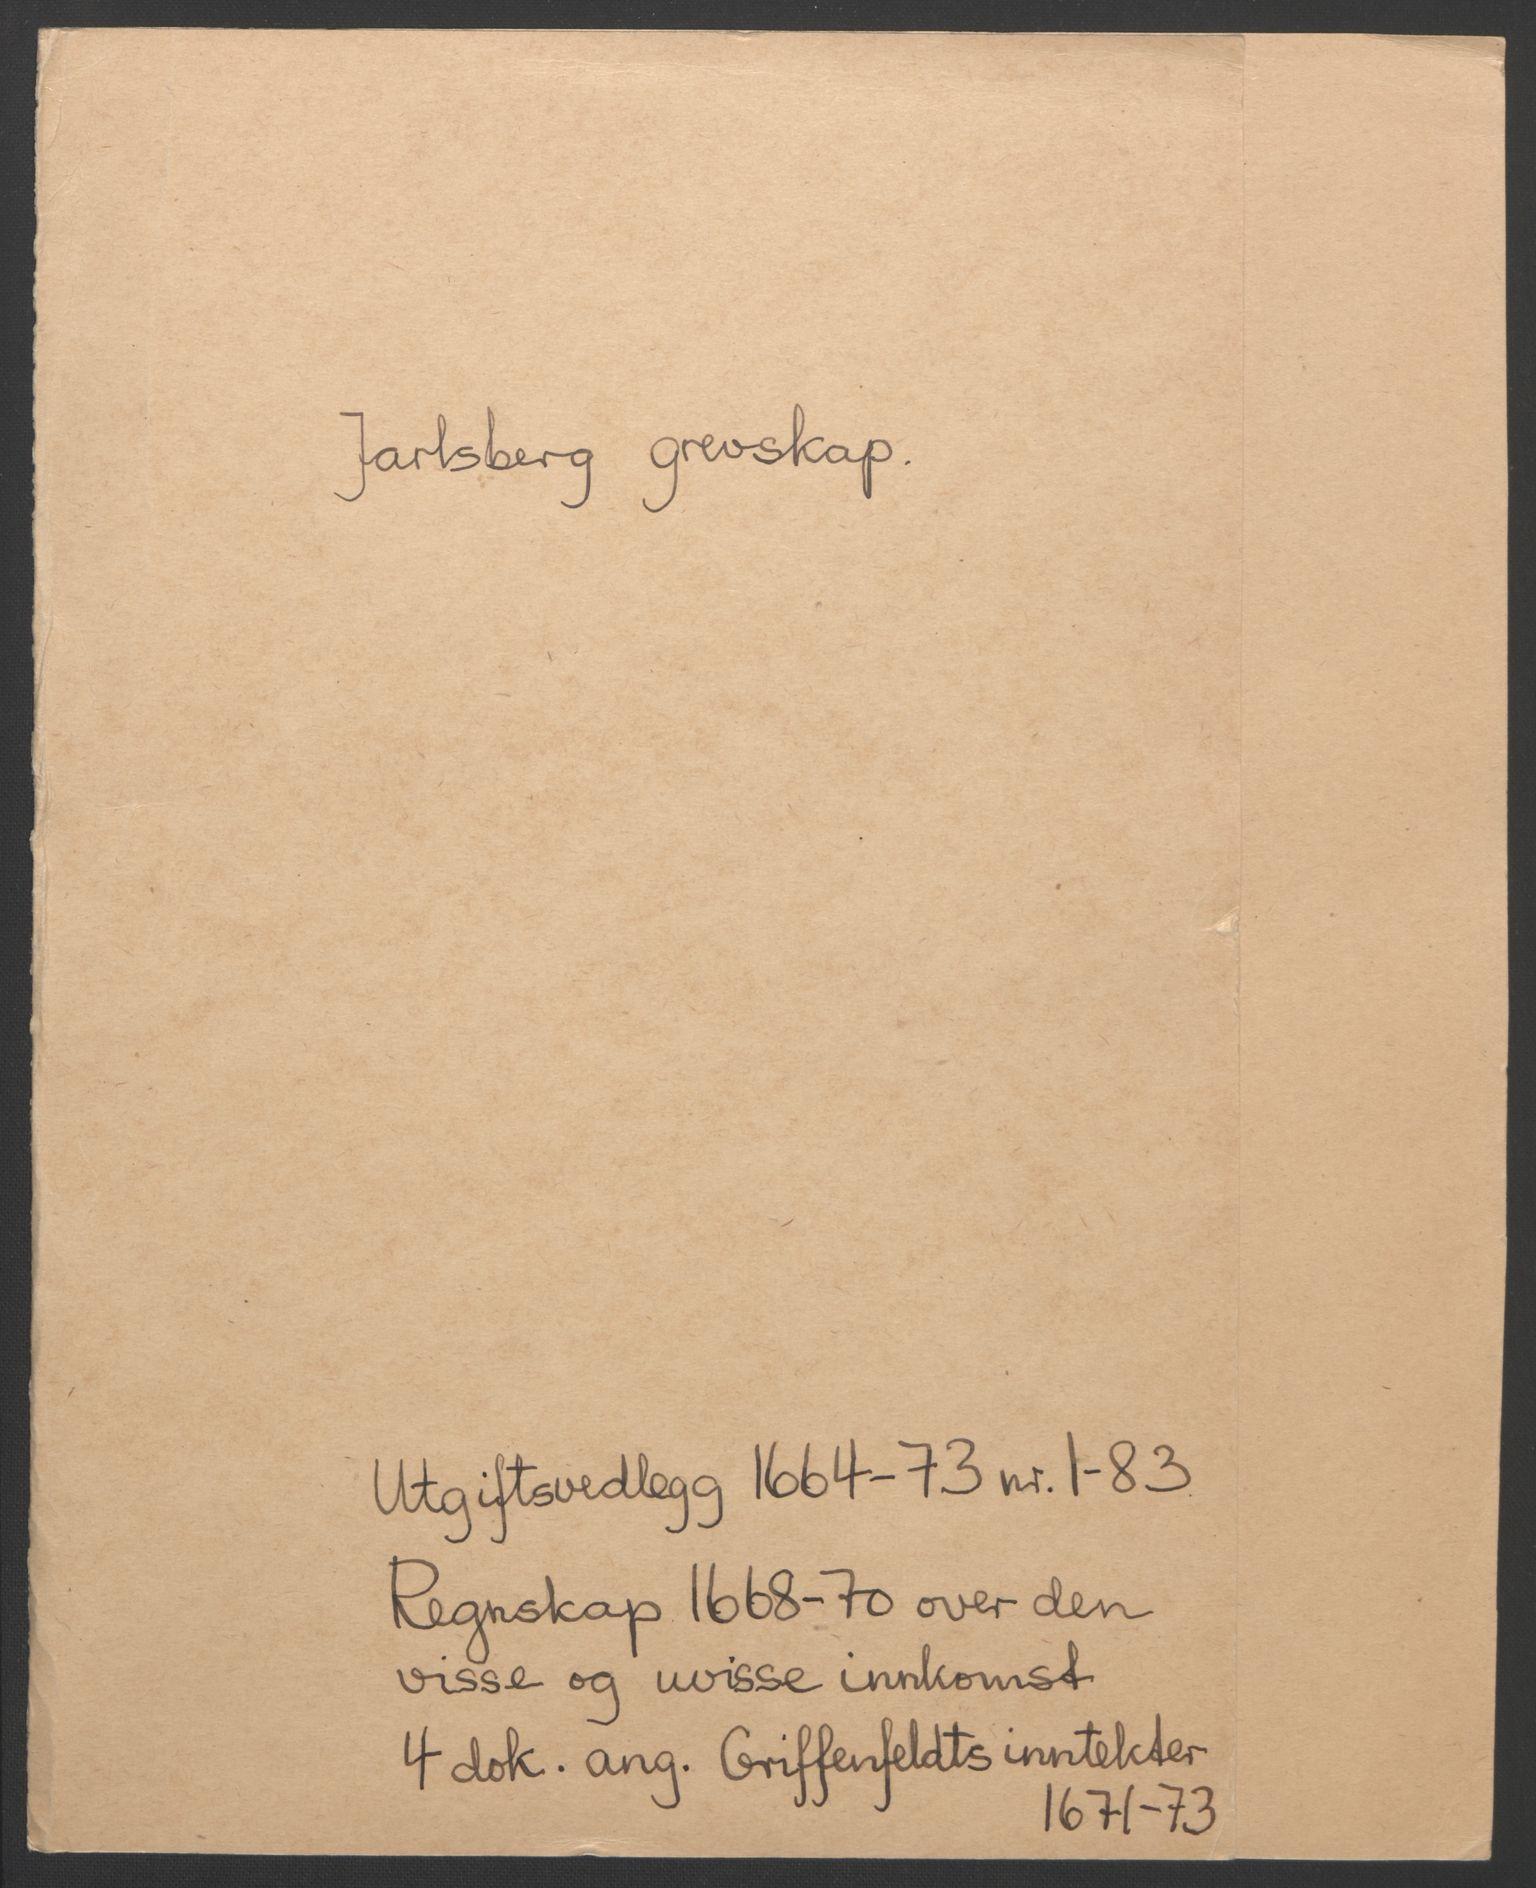 RA, Rentekammeret inntil 1814, Reviderte regnskaper, Fogderegnskap, R32/L1842: Fogderegnskap Jarlsberg grevskap, 1664-1673, s. 2